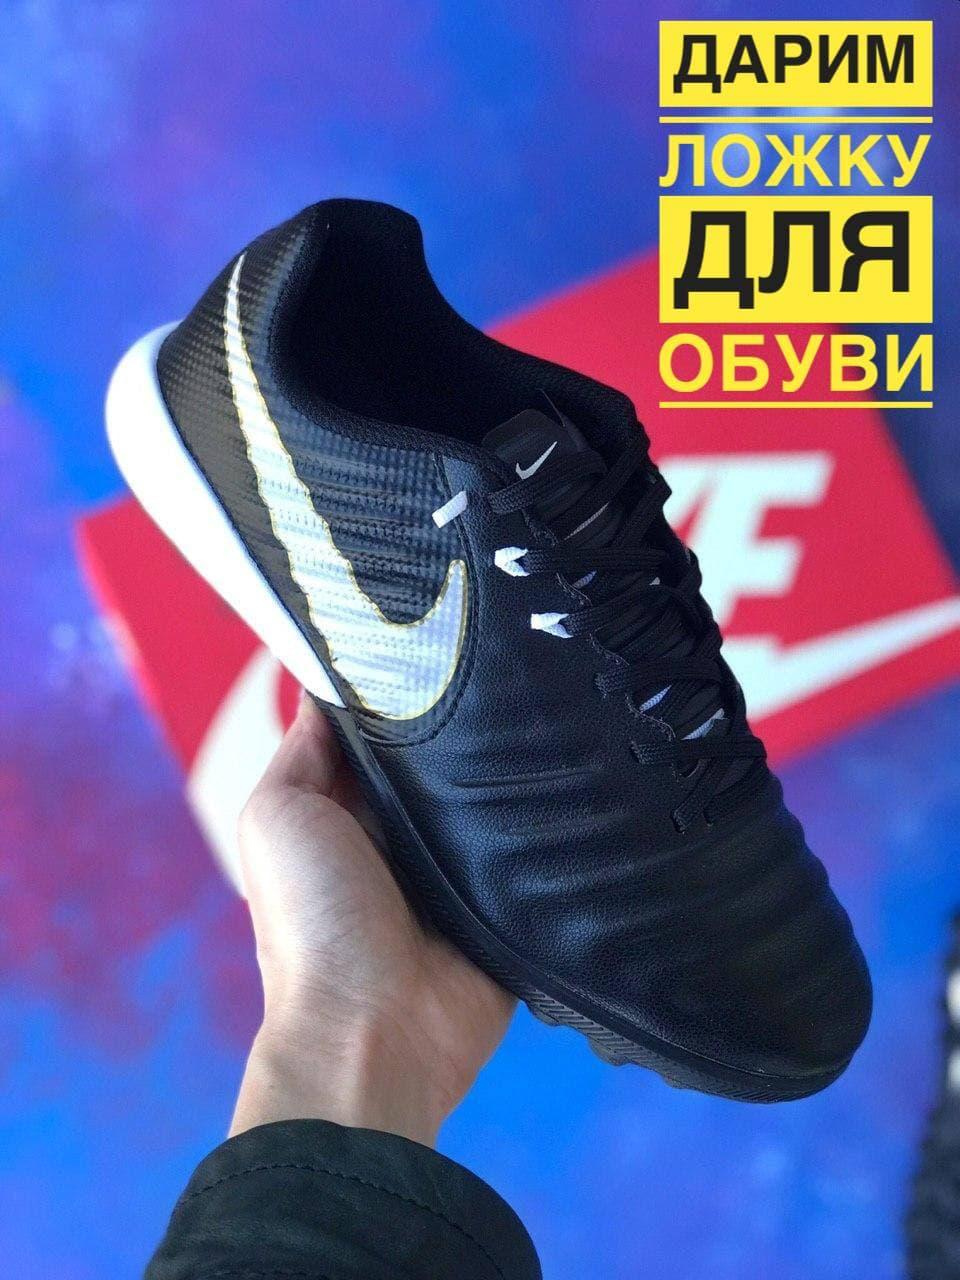 Сороконожки Nike Tiempo Ligera IV TF многошиповки найк темпо тиемпо бампы лигера